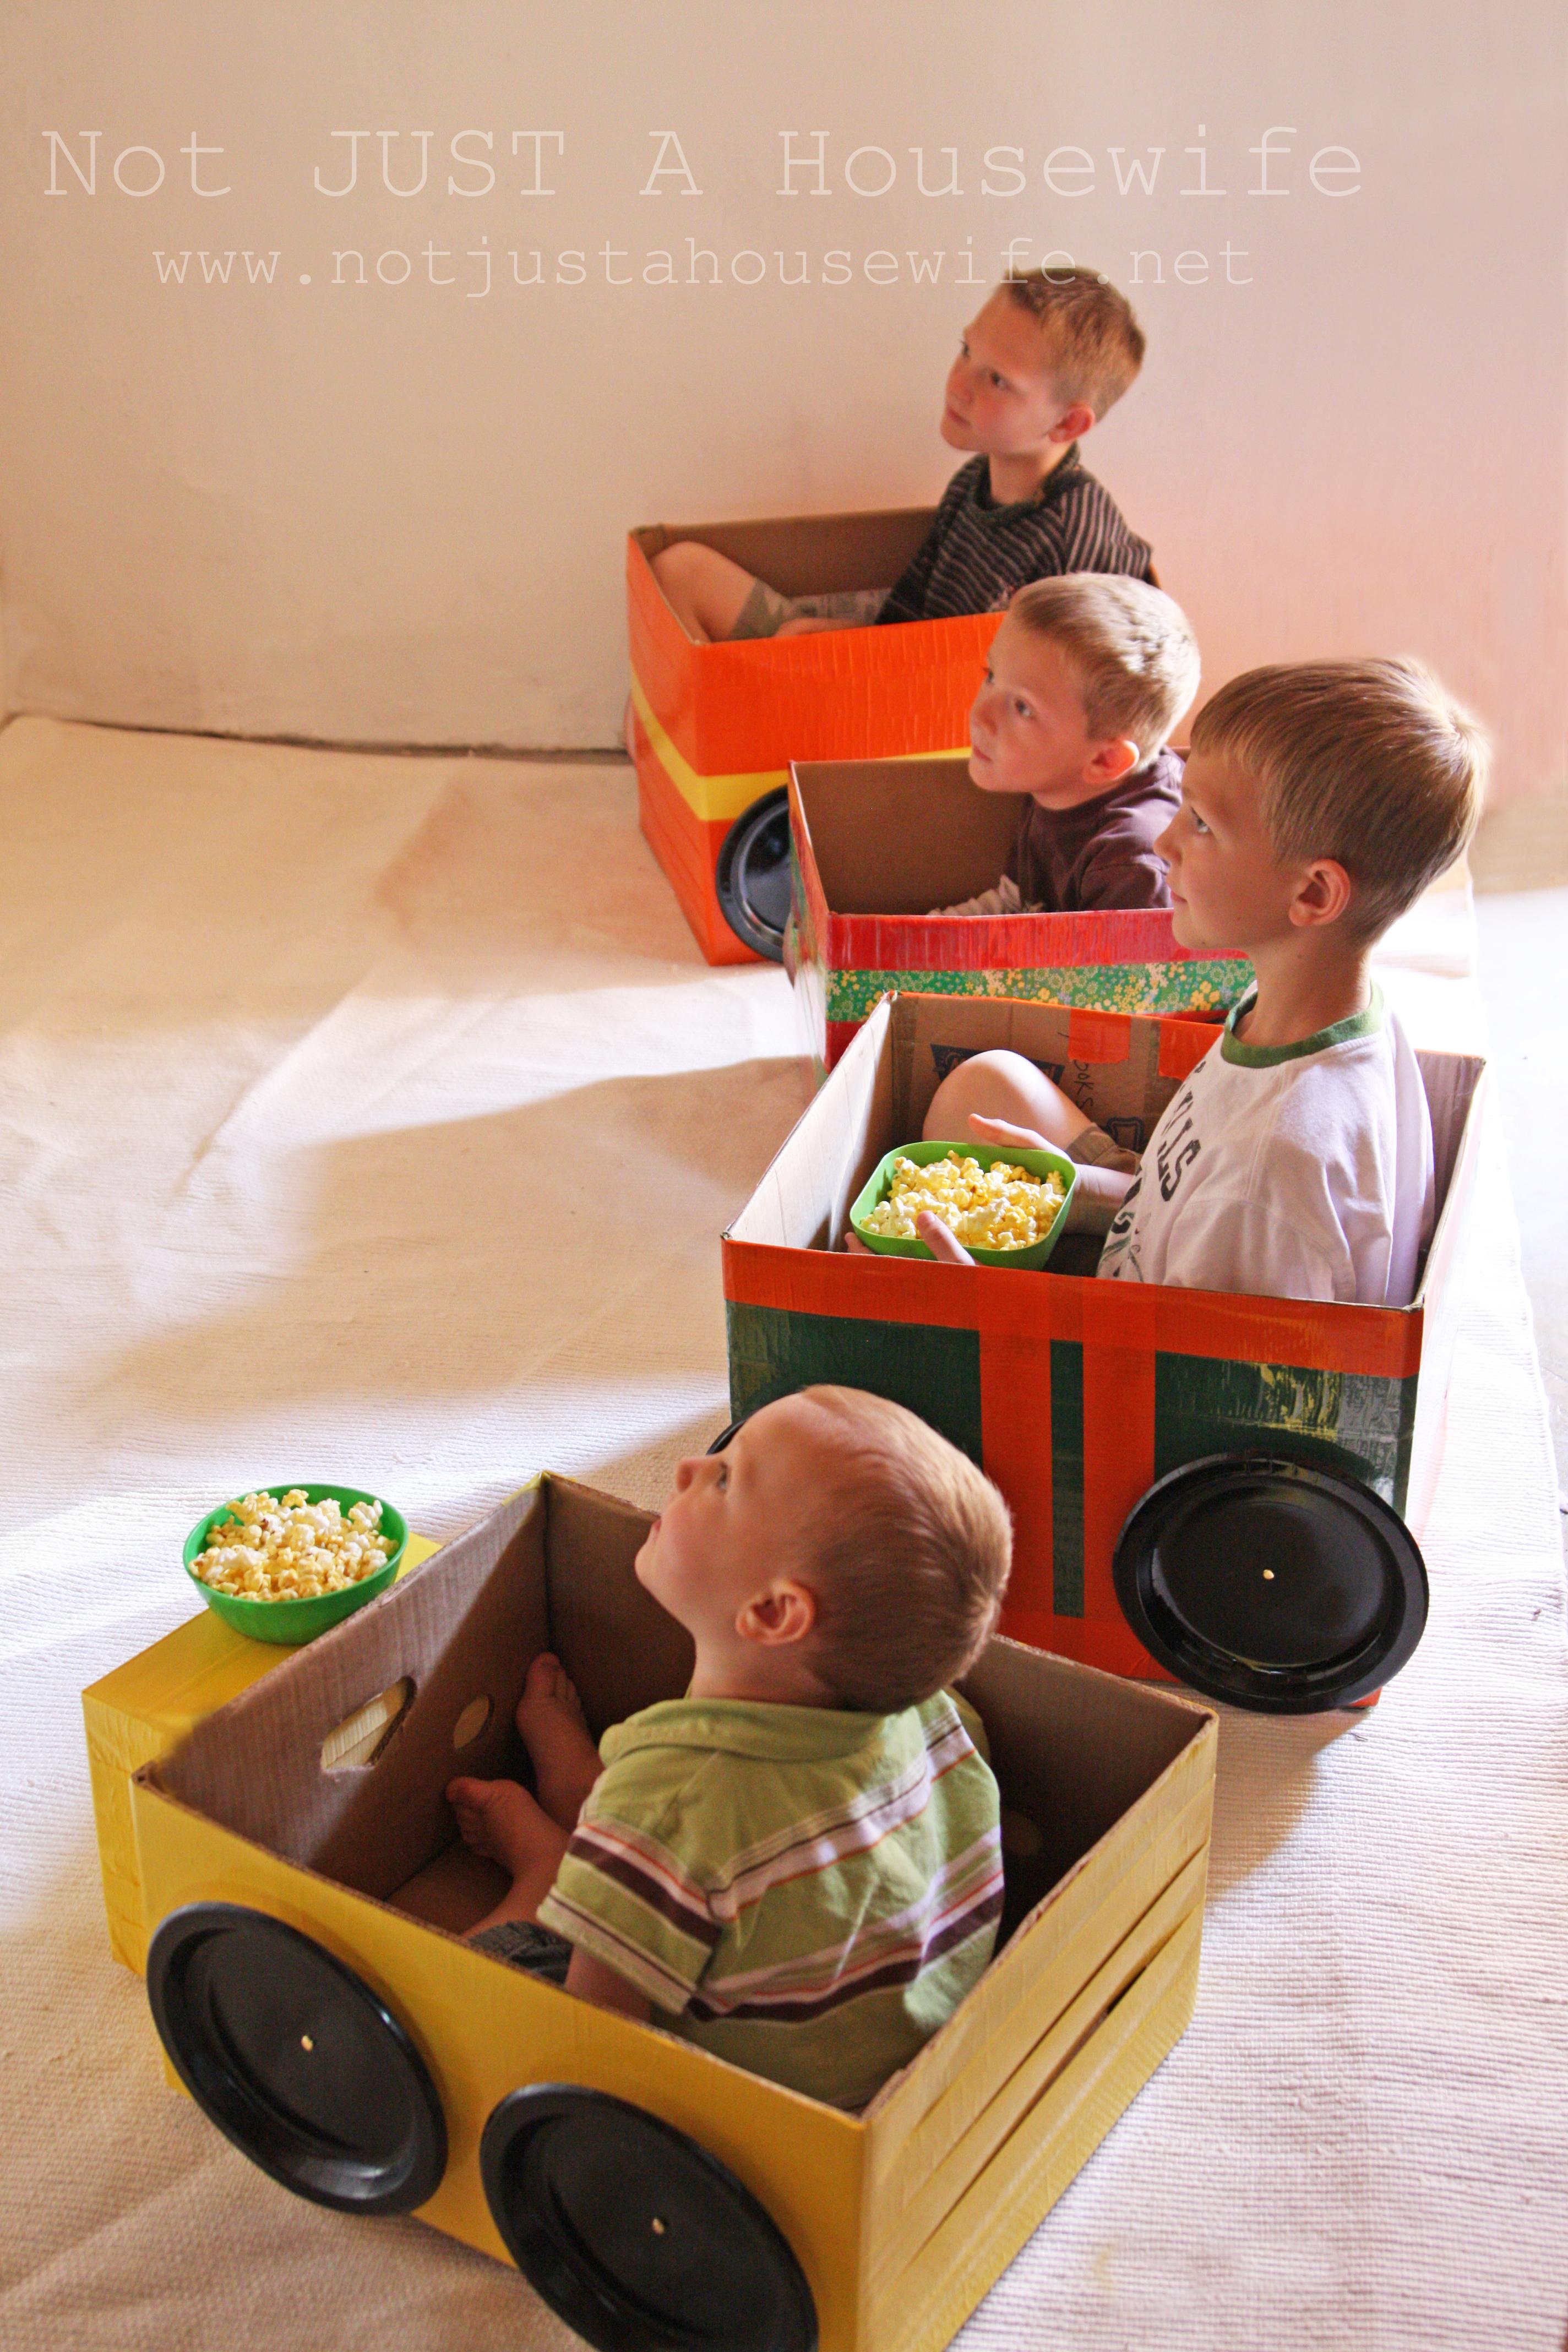 Diy Toddler Boy Haircut: 32 Fun And Creative DIY Indoor Activities Your Kids Will Love